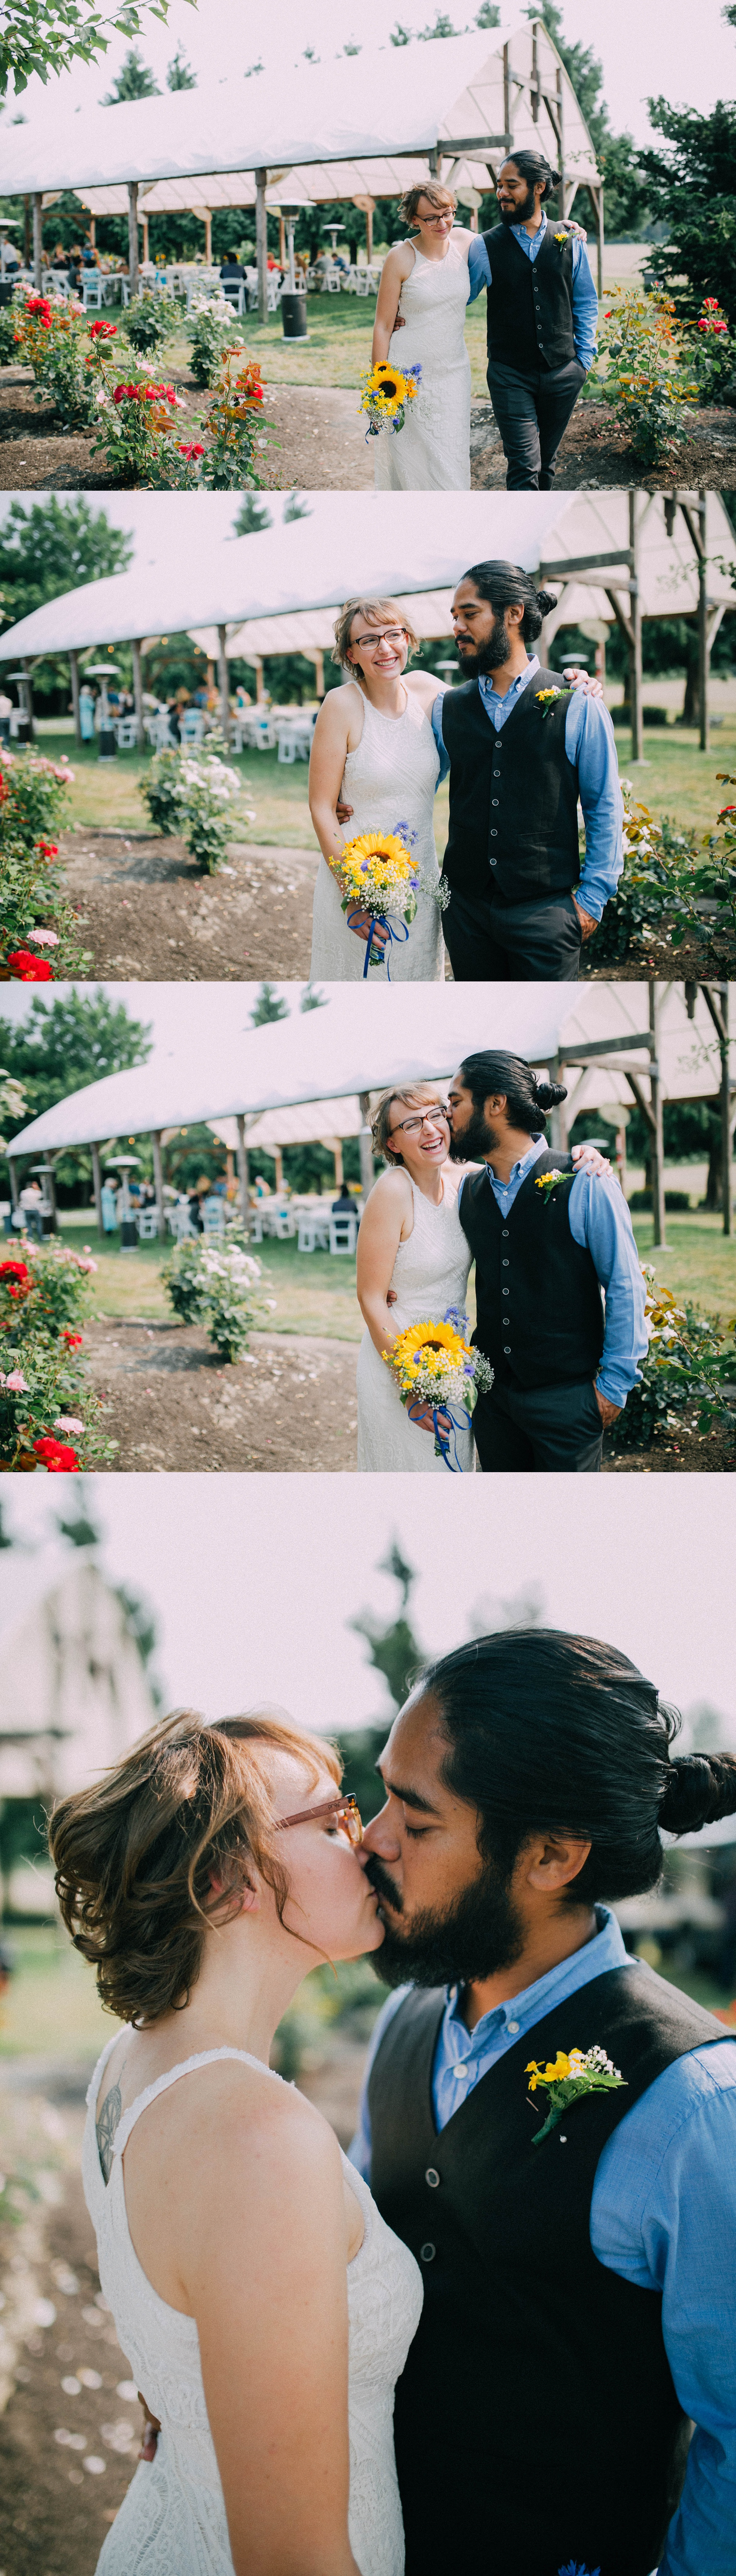 ashley_vos_seattle_ wedding_photographer_0456.jpg